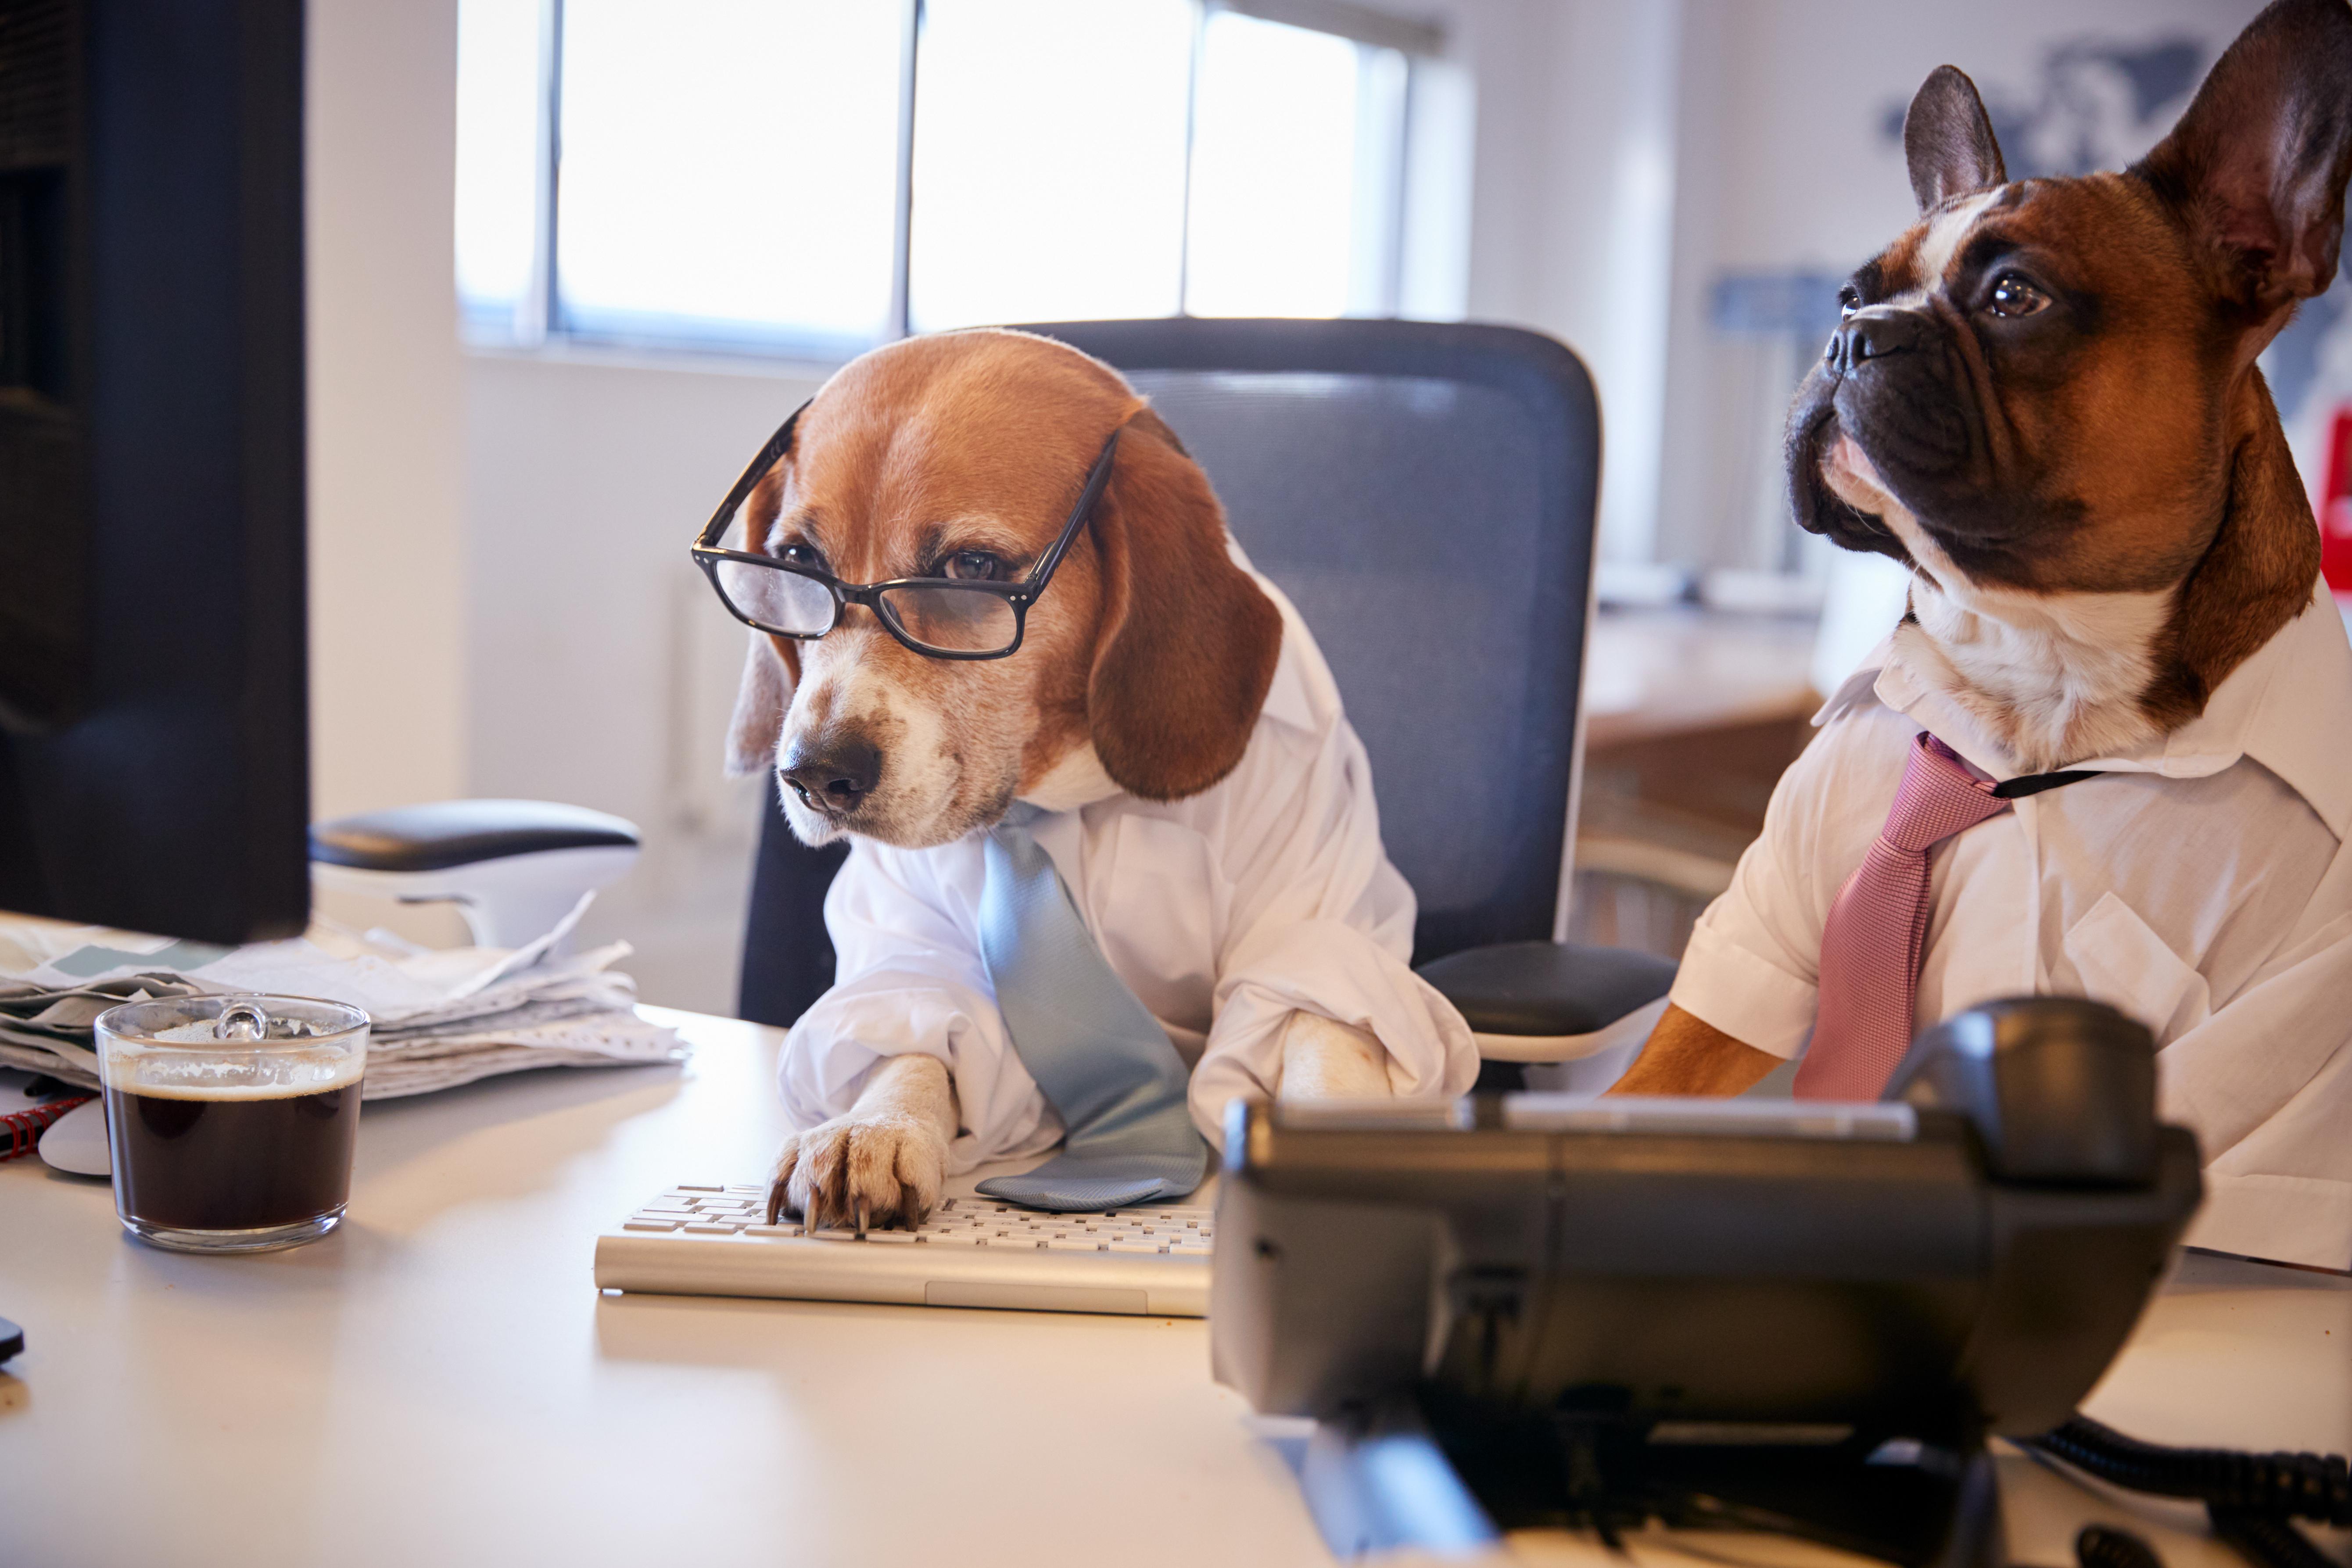 Kursangebote_Hundeschule_Hundetraining